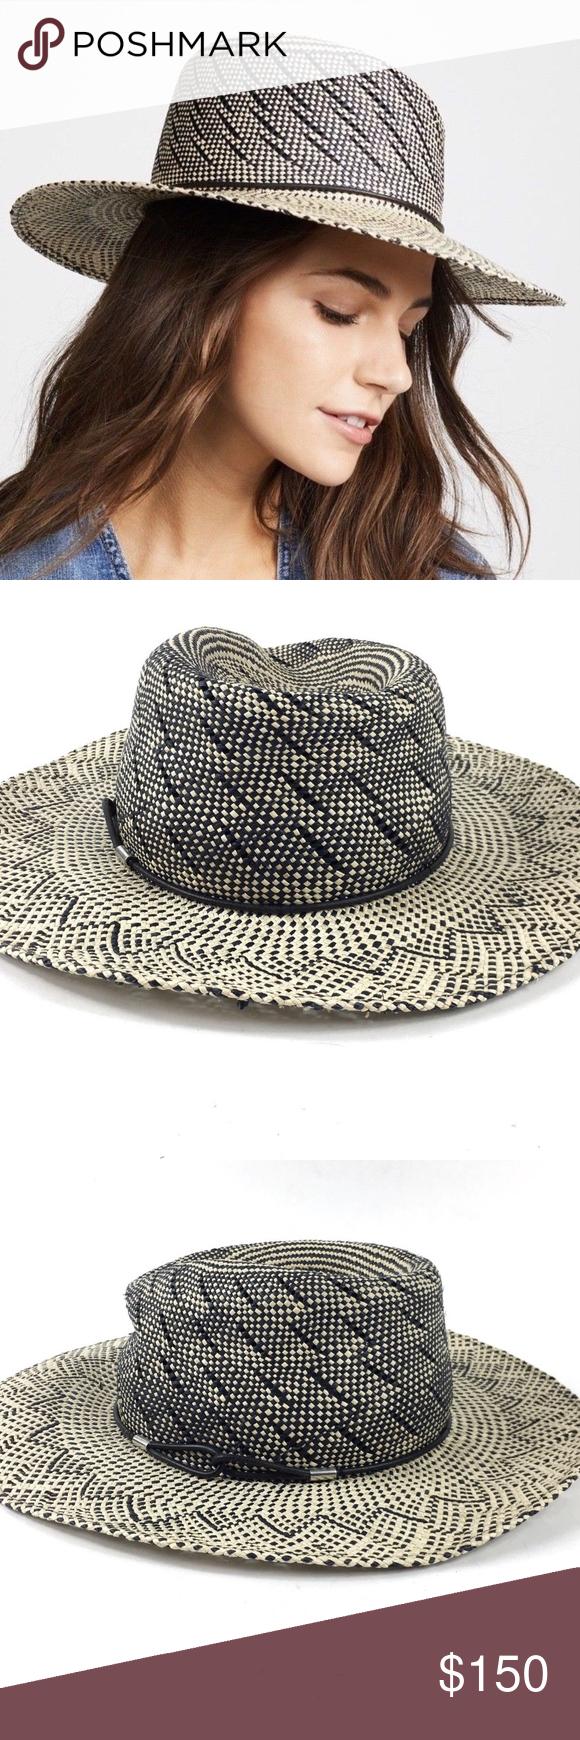 c2e26a4350dcc3 Size Medium / Large Rag and Bone Straw Fedora Hat Pre-Owned Rag and Bone